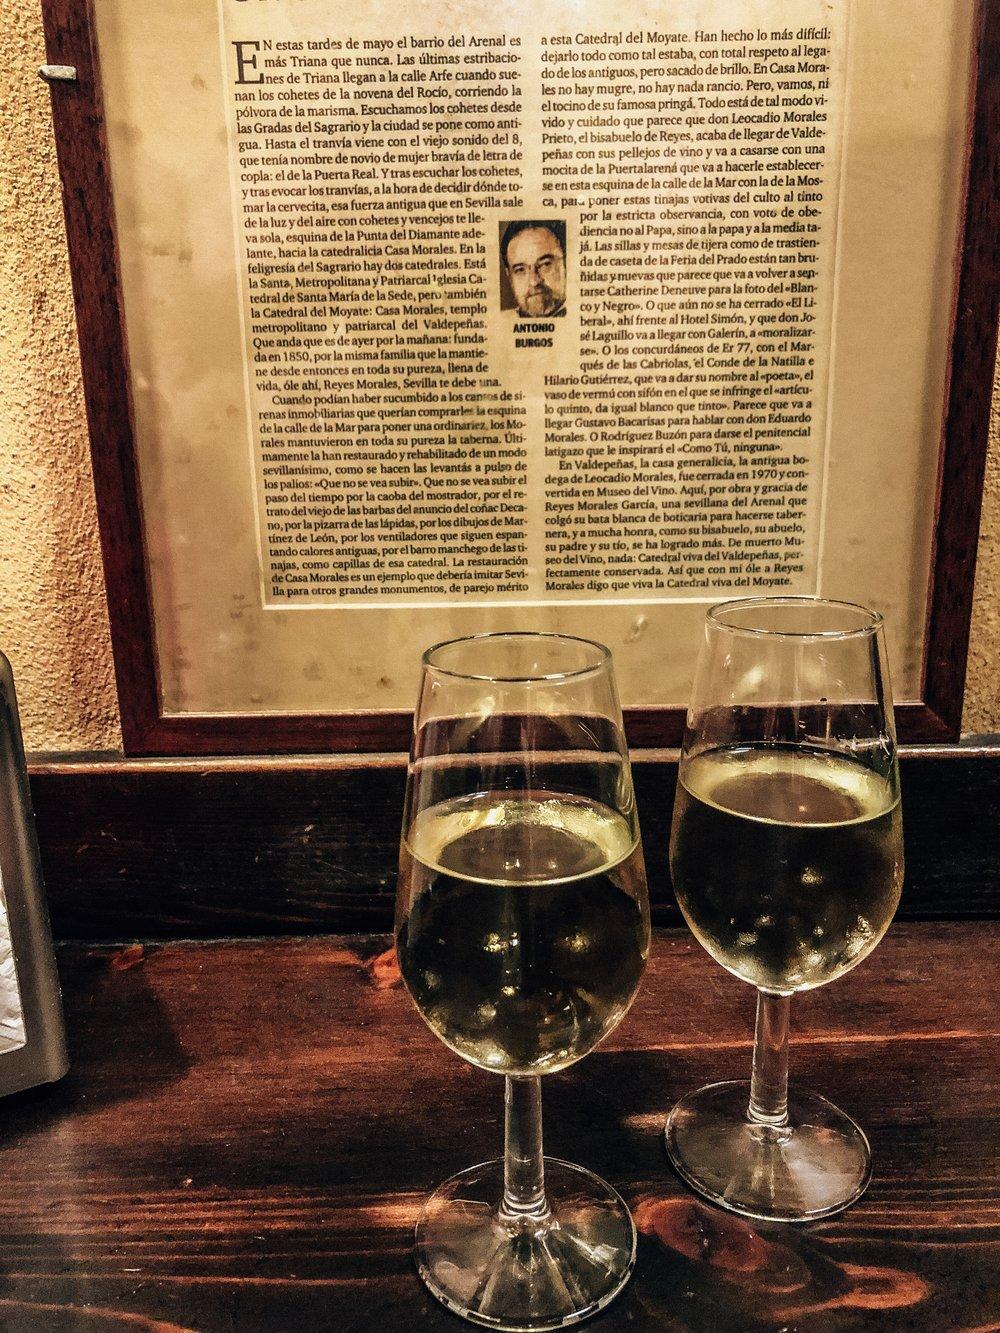 Dry Manzanilla sherry from Sanlucar de Barrameda